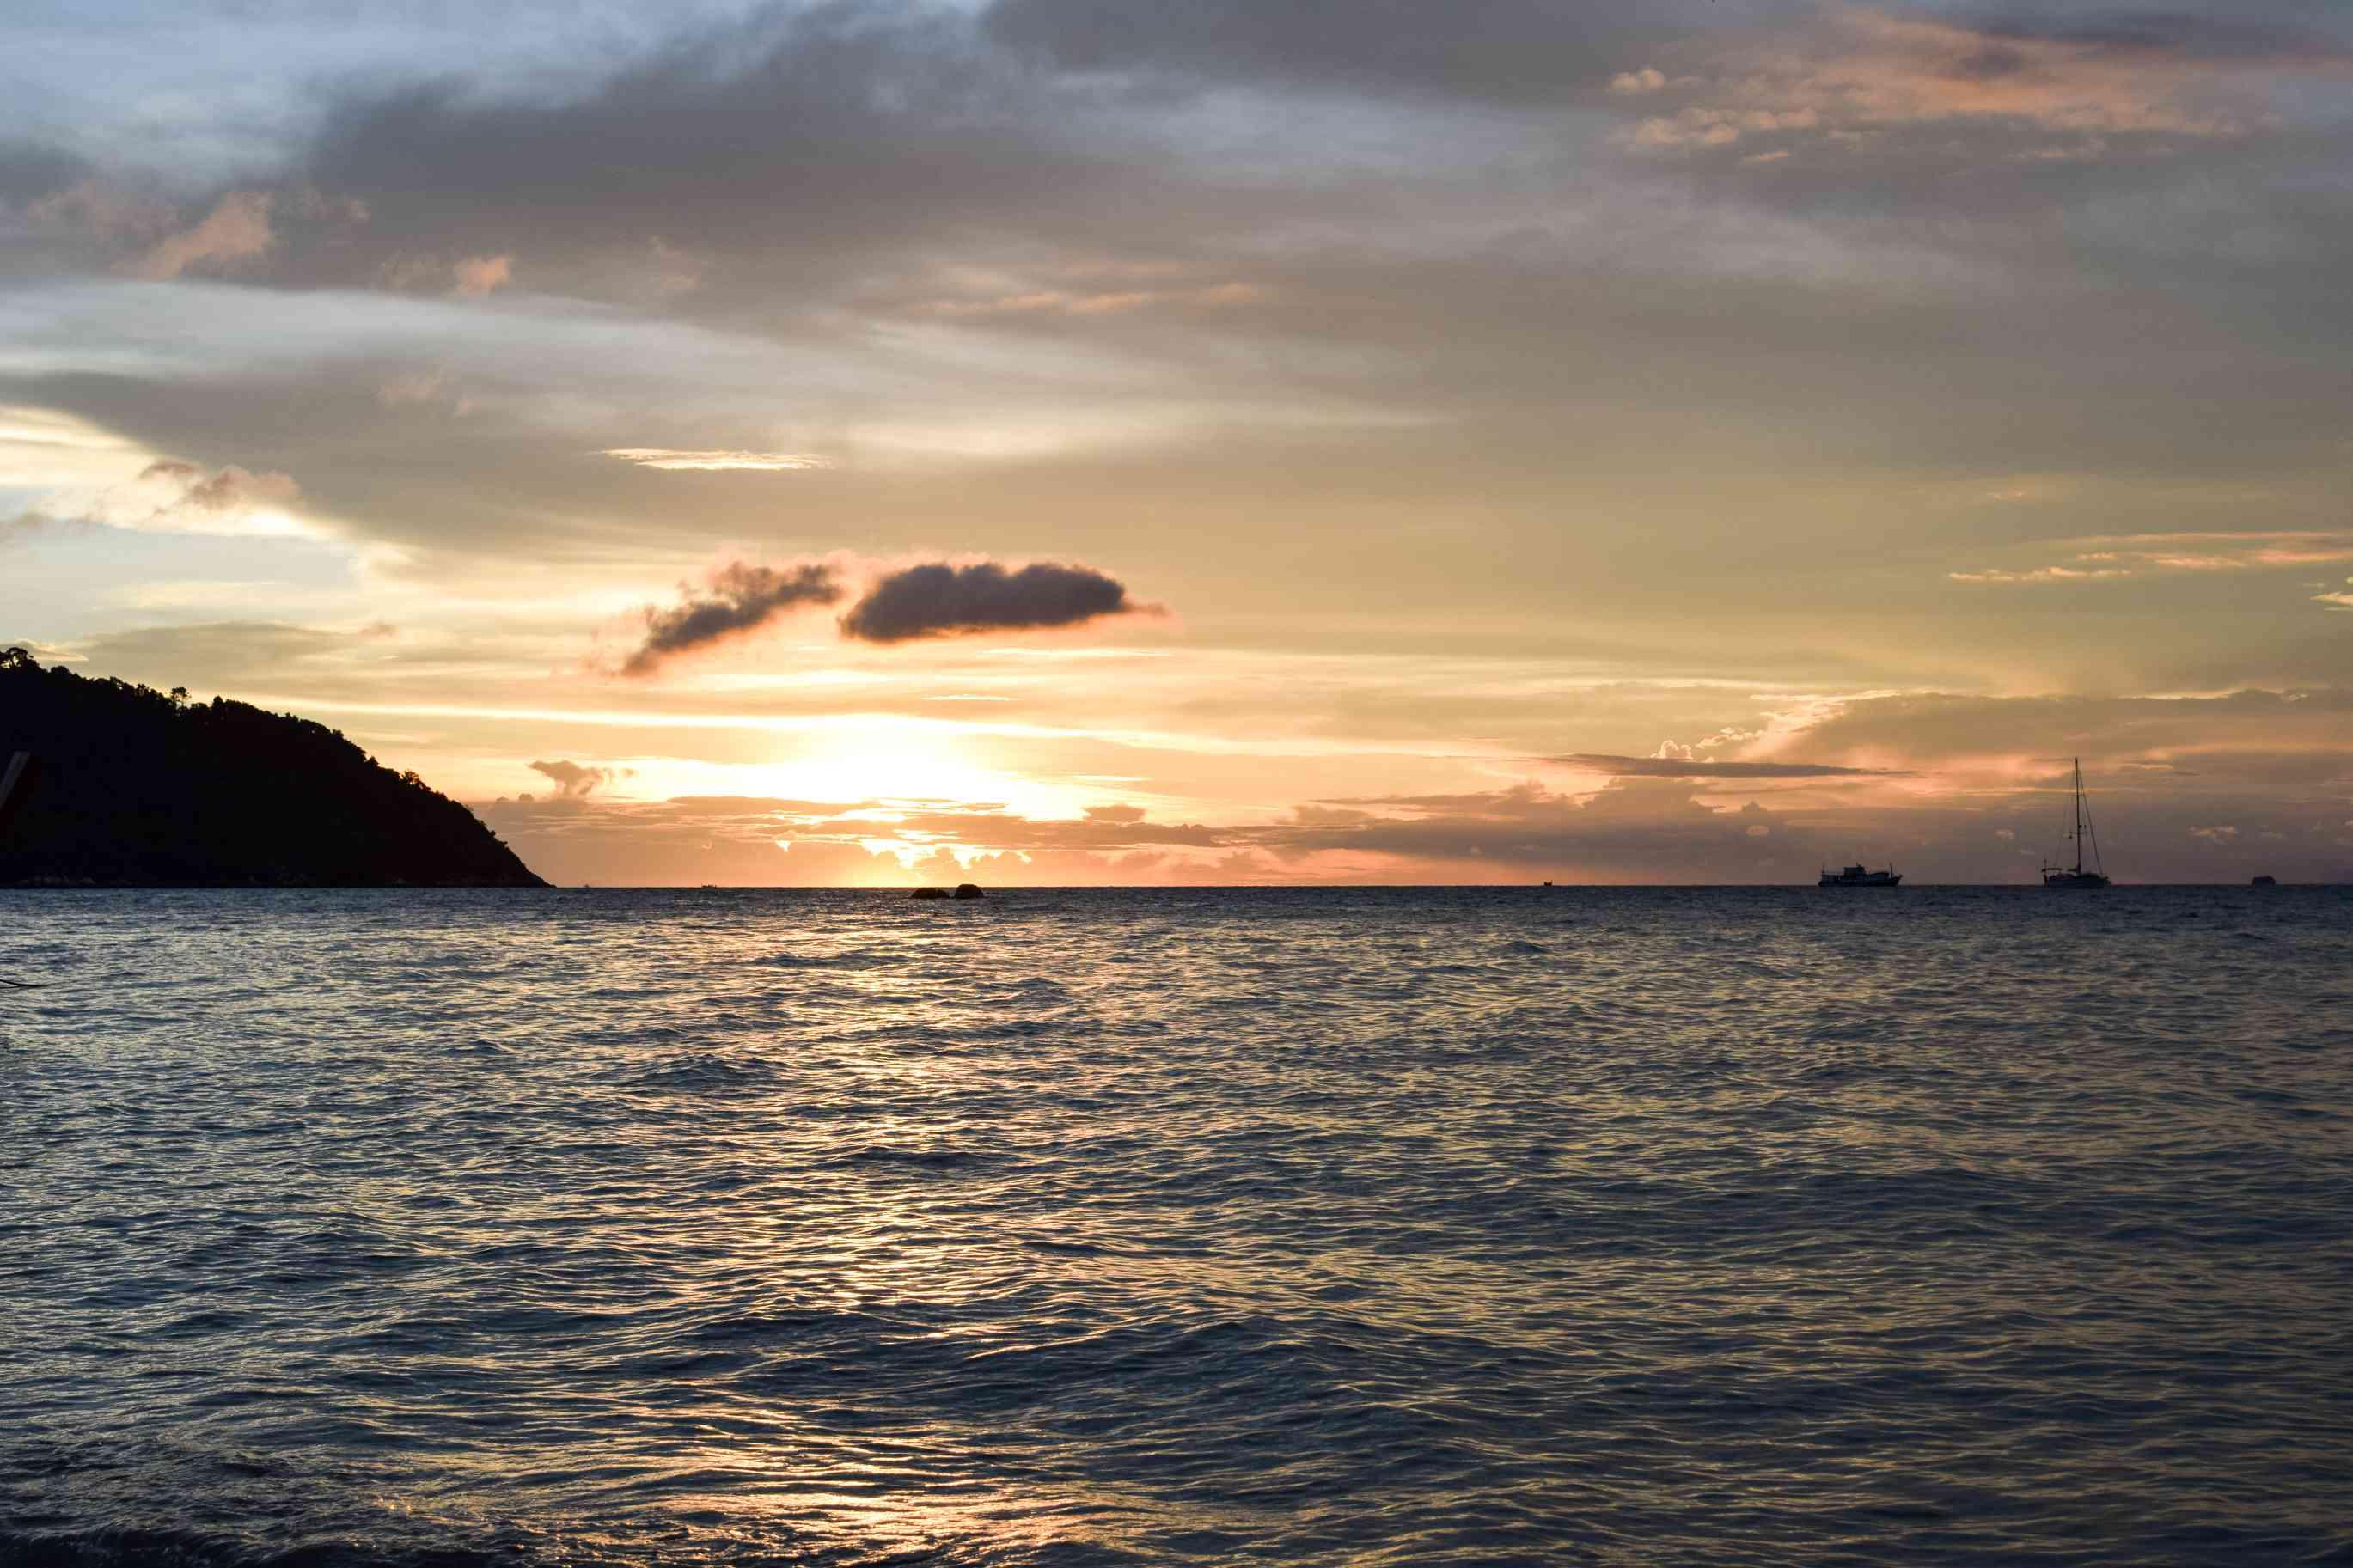 Sunset off the coast of Koh Lipe